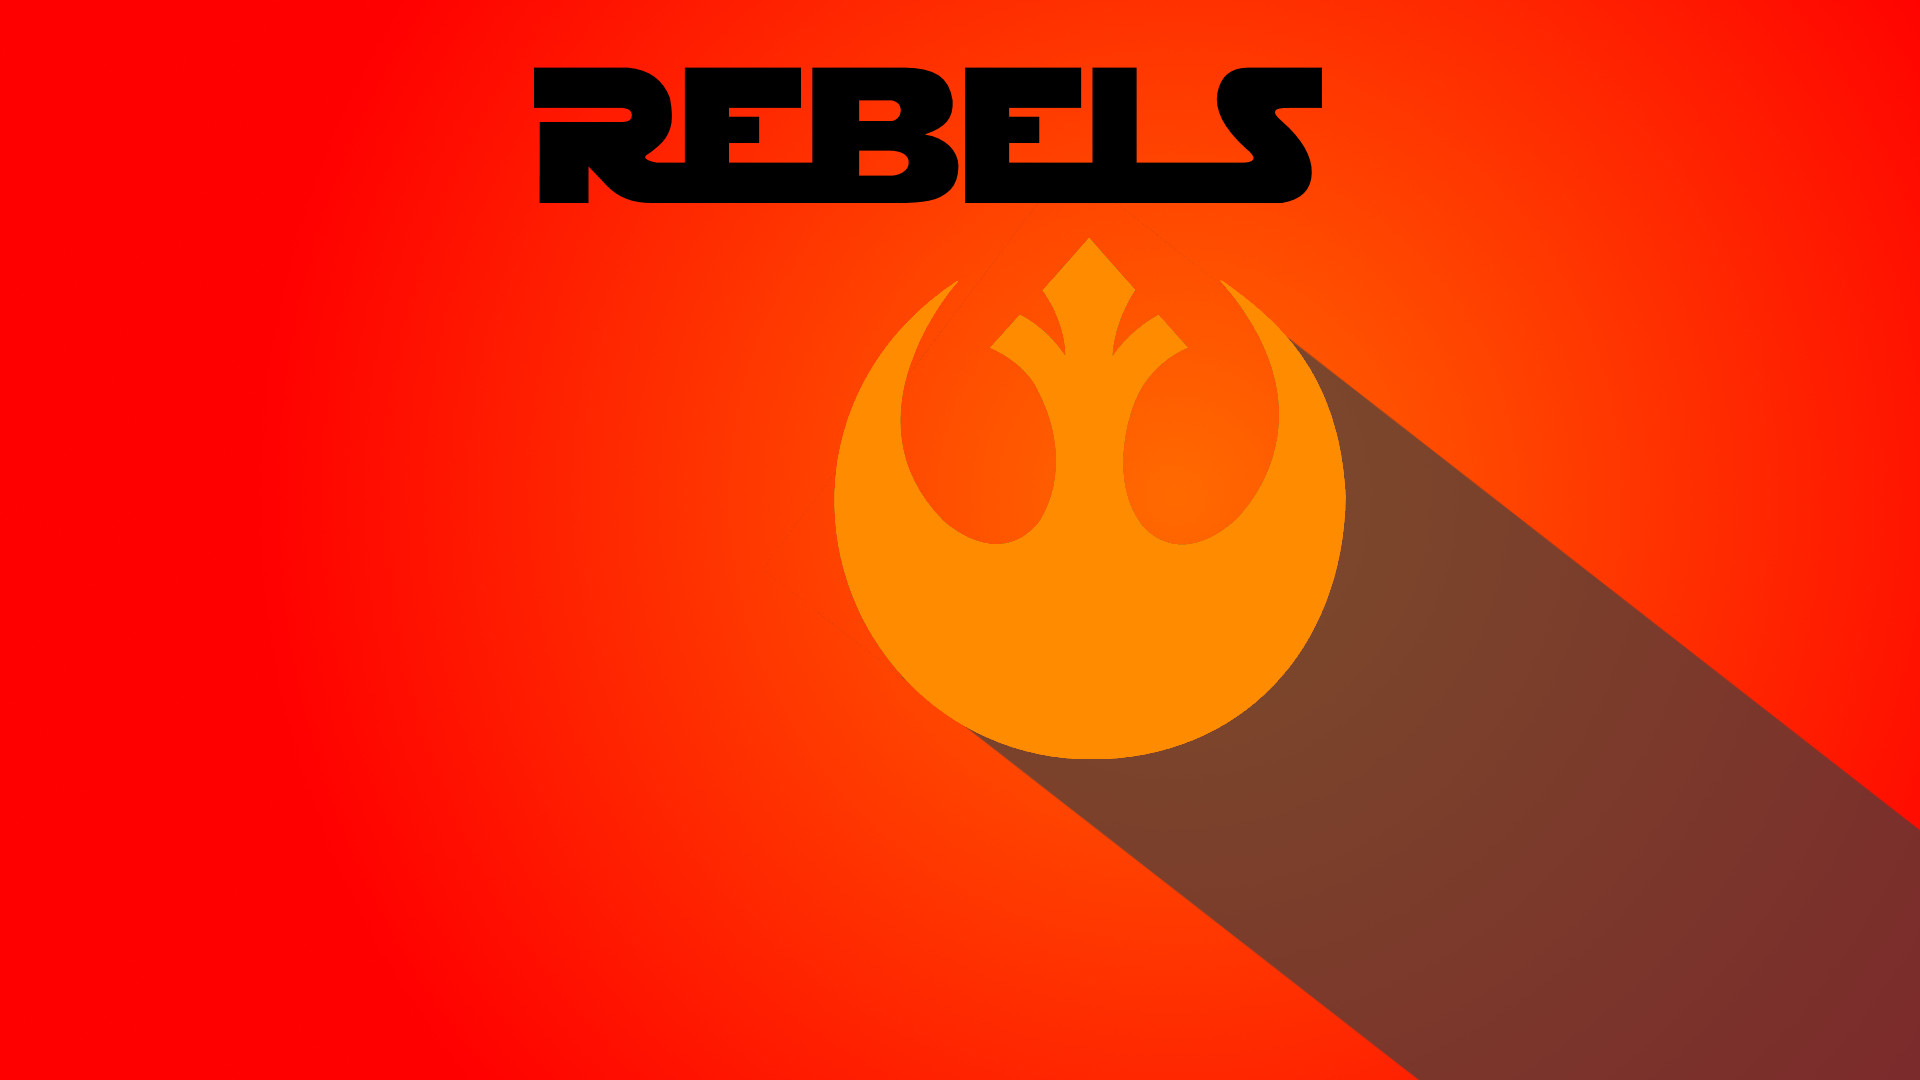 Star Wars Rebels Wallpaper by BiloBoy Star Wars Rebels Wallpaper by BiloBoy